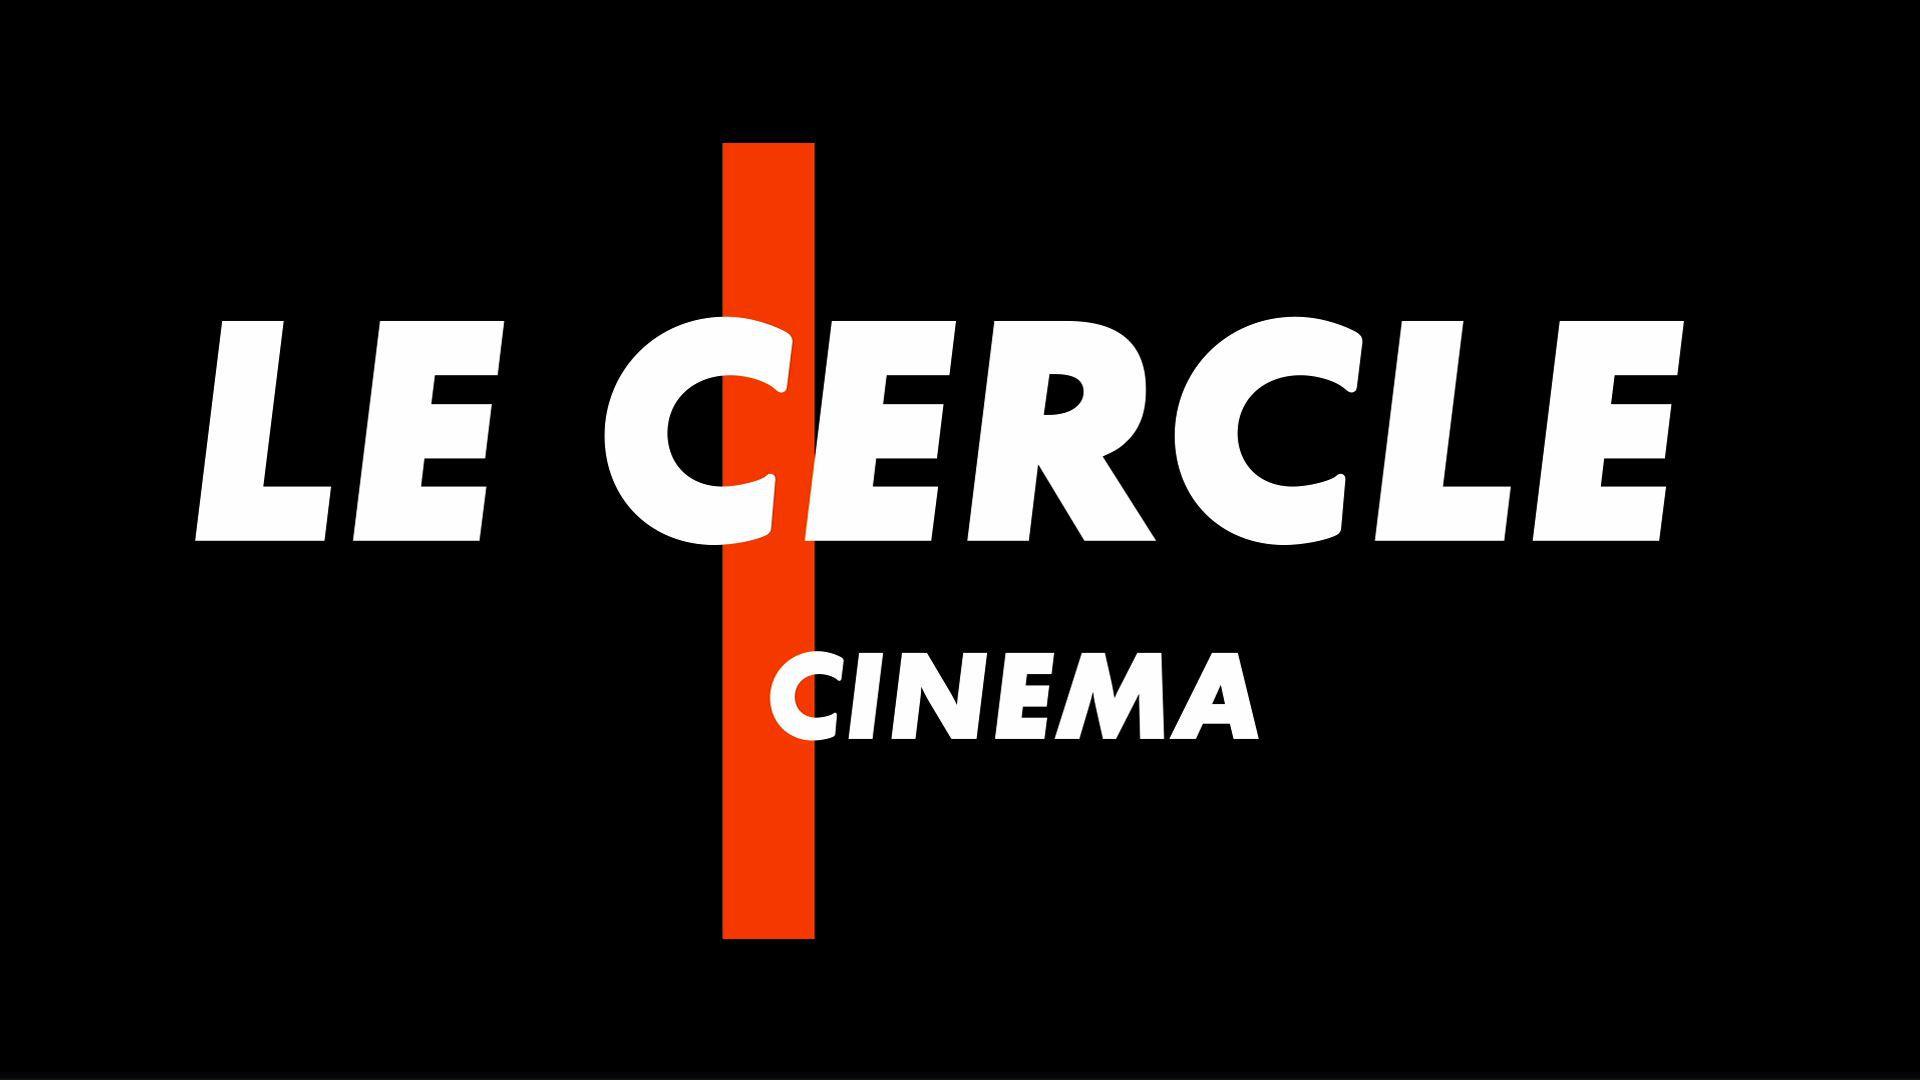 LE CERCLE CINEMA CANAL+